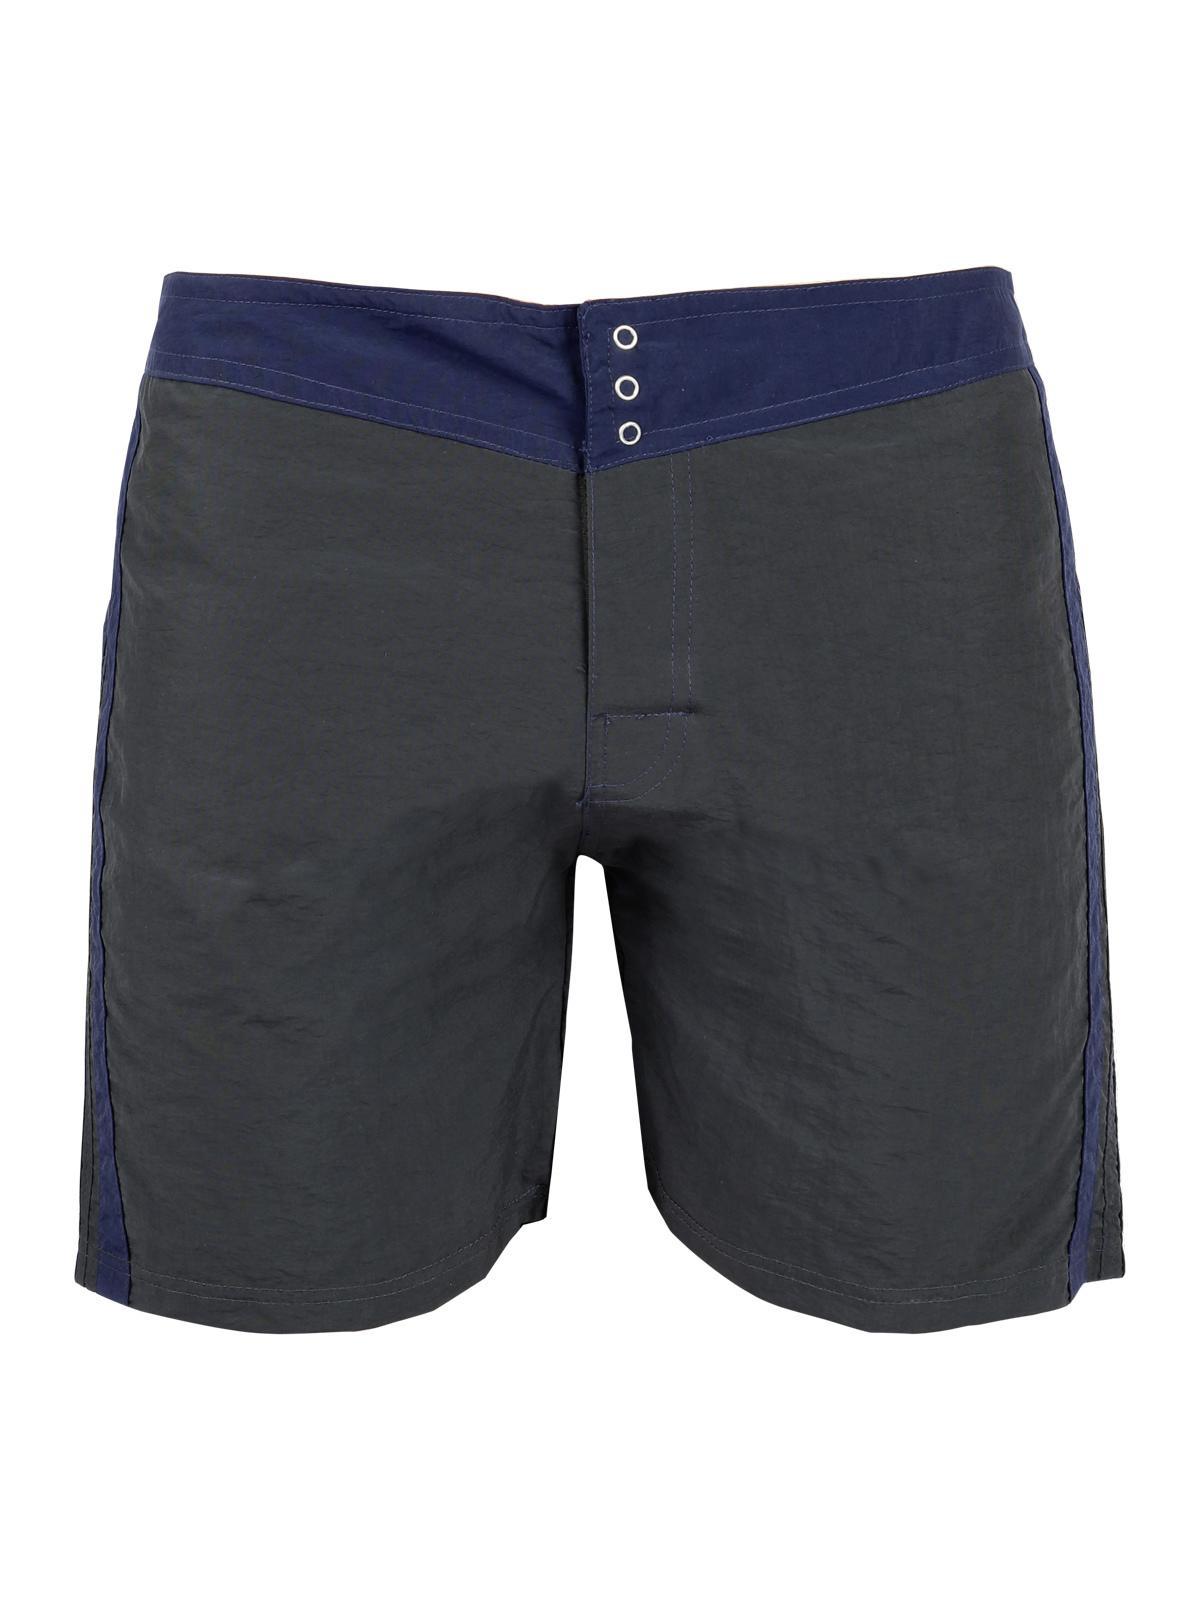 Shorts da bagno uomo stormy life   MecShopping